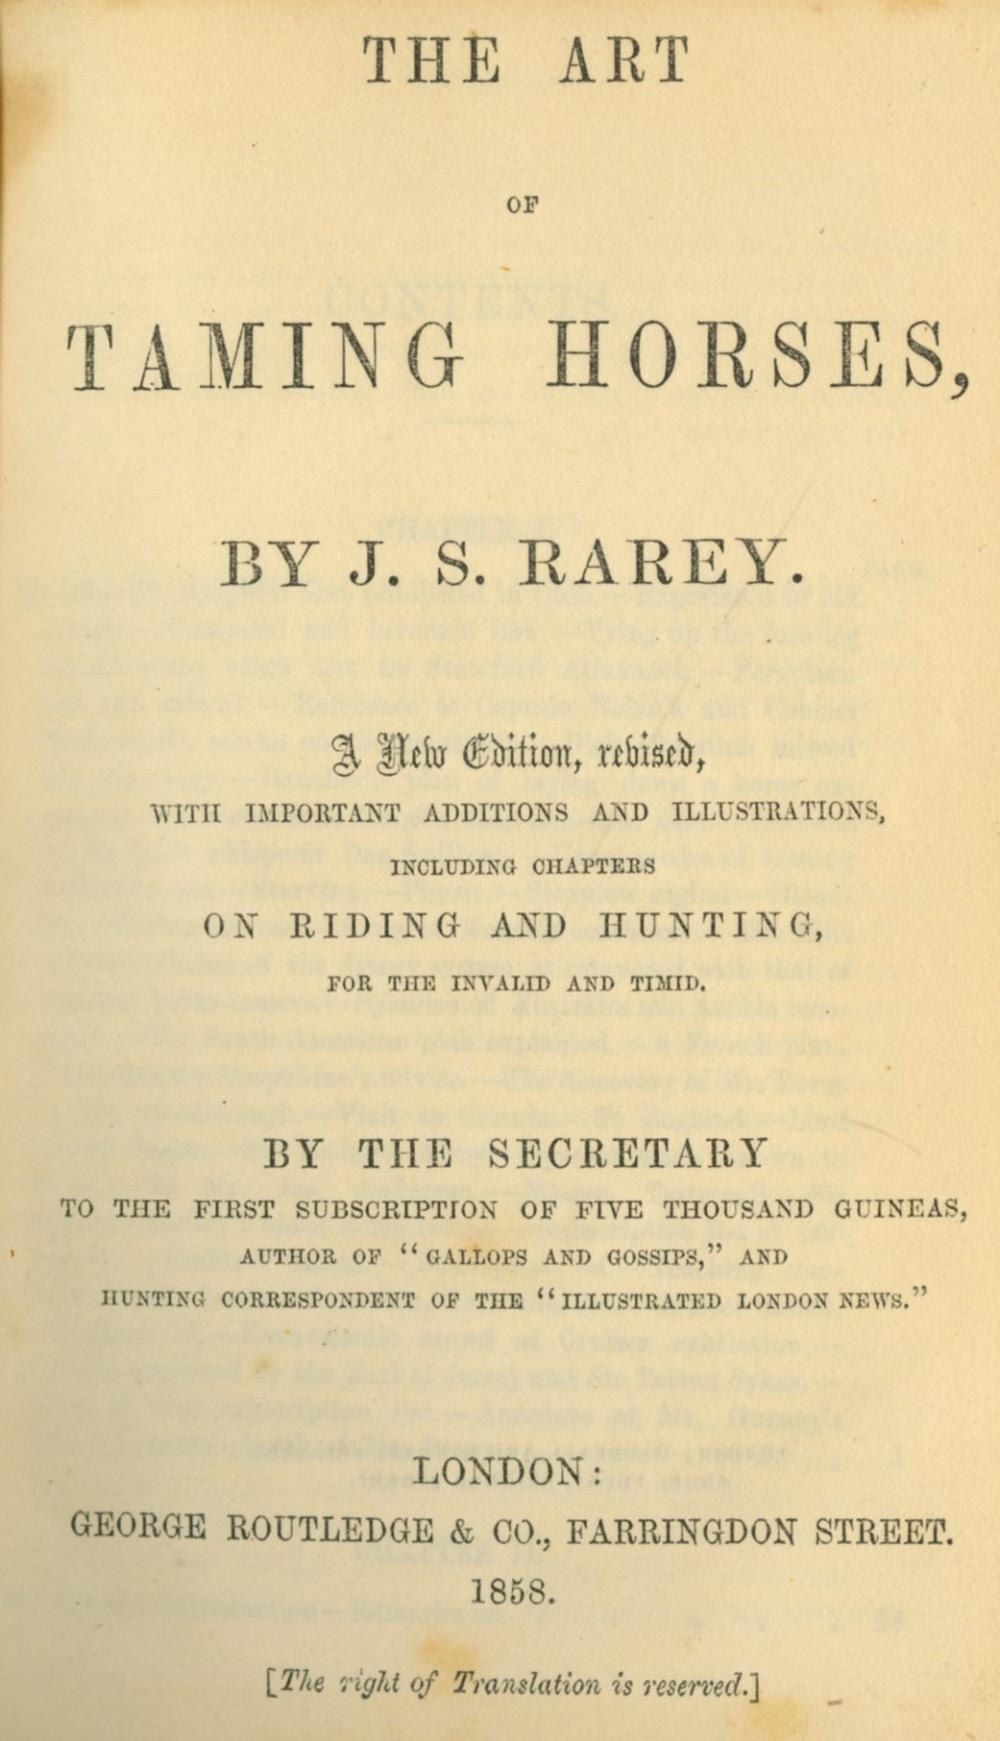 Equestrian Interest: Rarey (J.S.) The Art of Taming Horses, 12mo L. 1858, frontis & other illus.